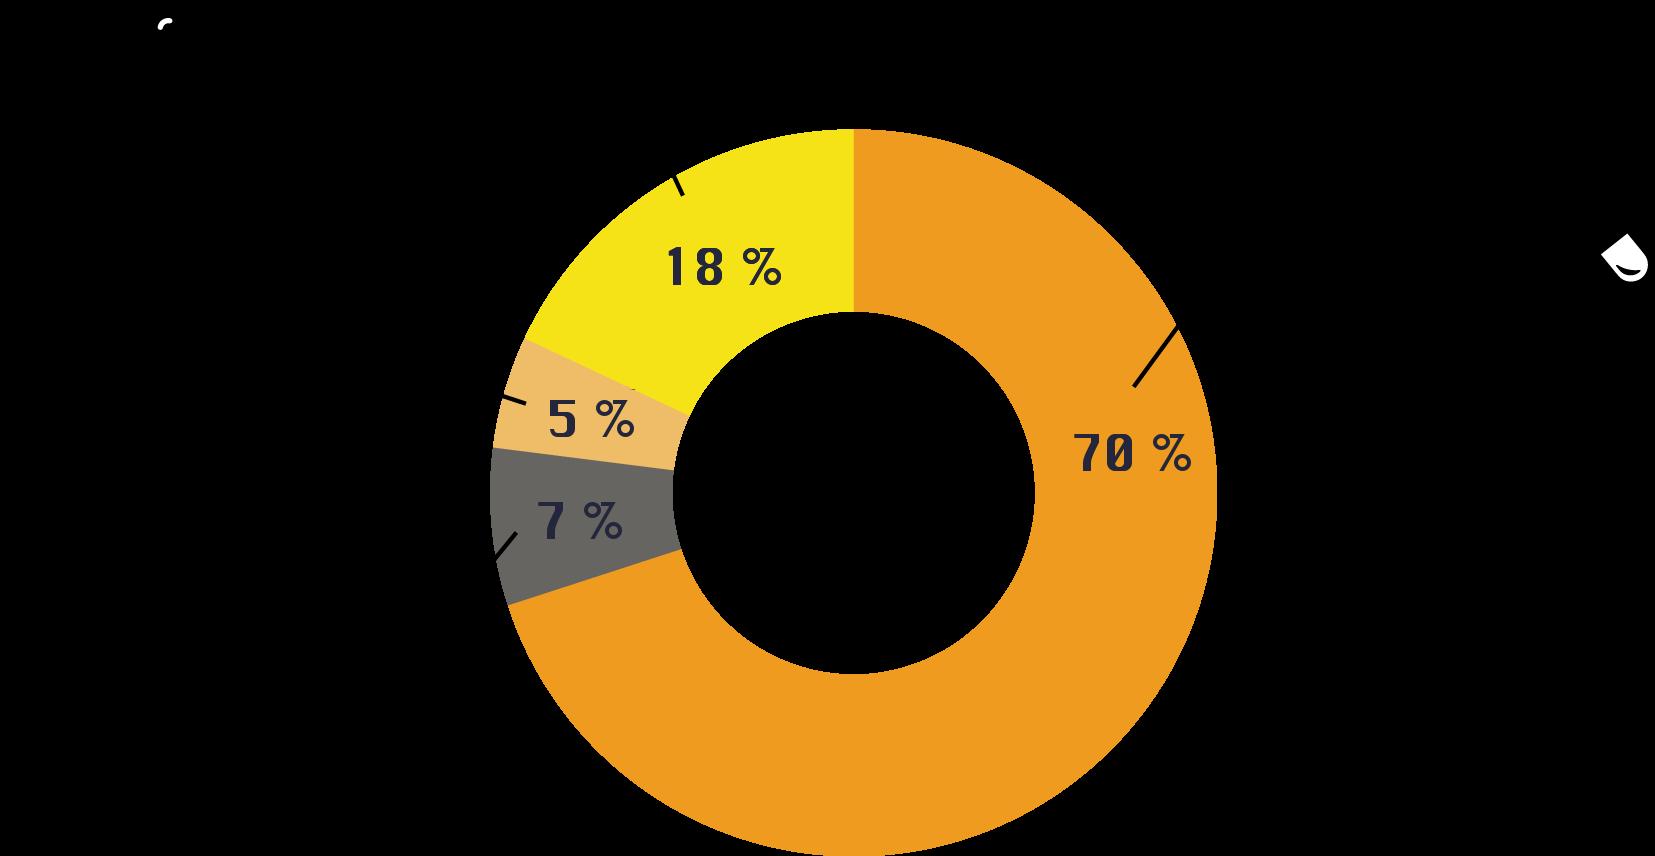 Minafin Pie Chart of markets served